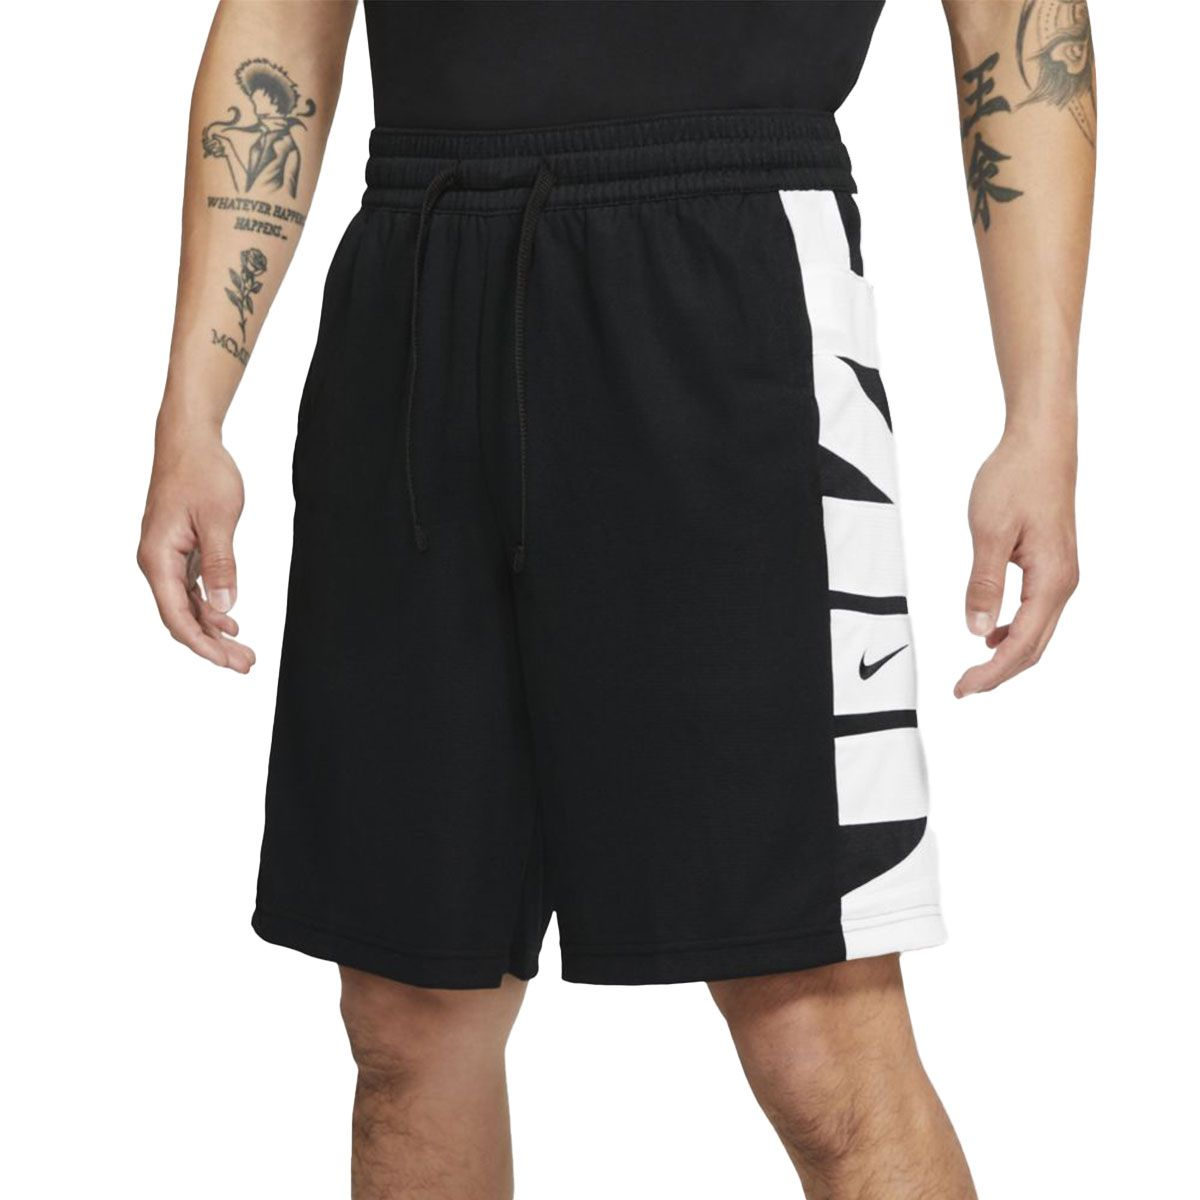 Nike Short Dri-FIT Uomo Nero Bianco